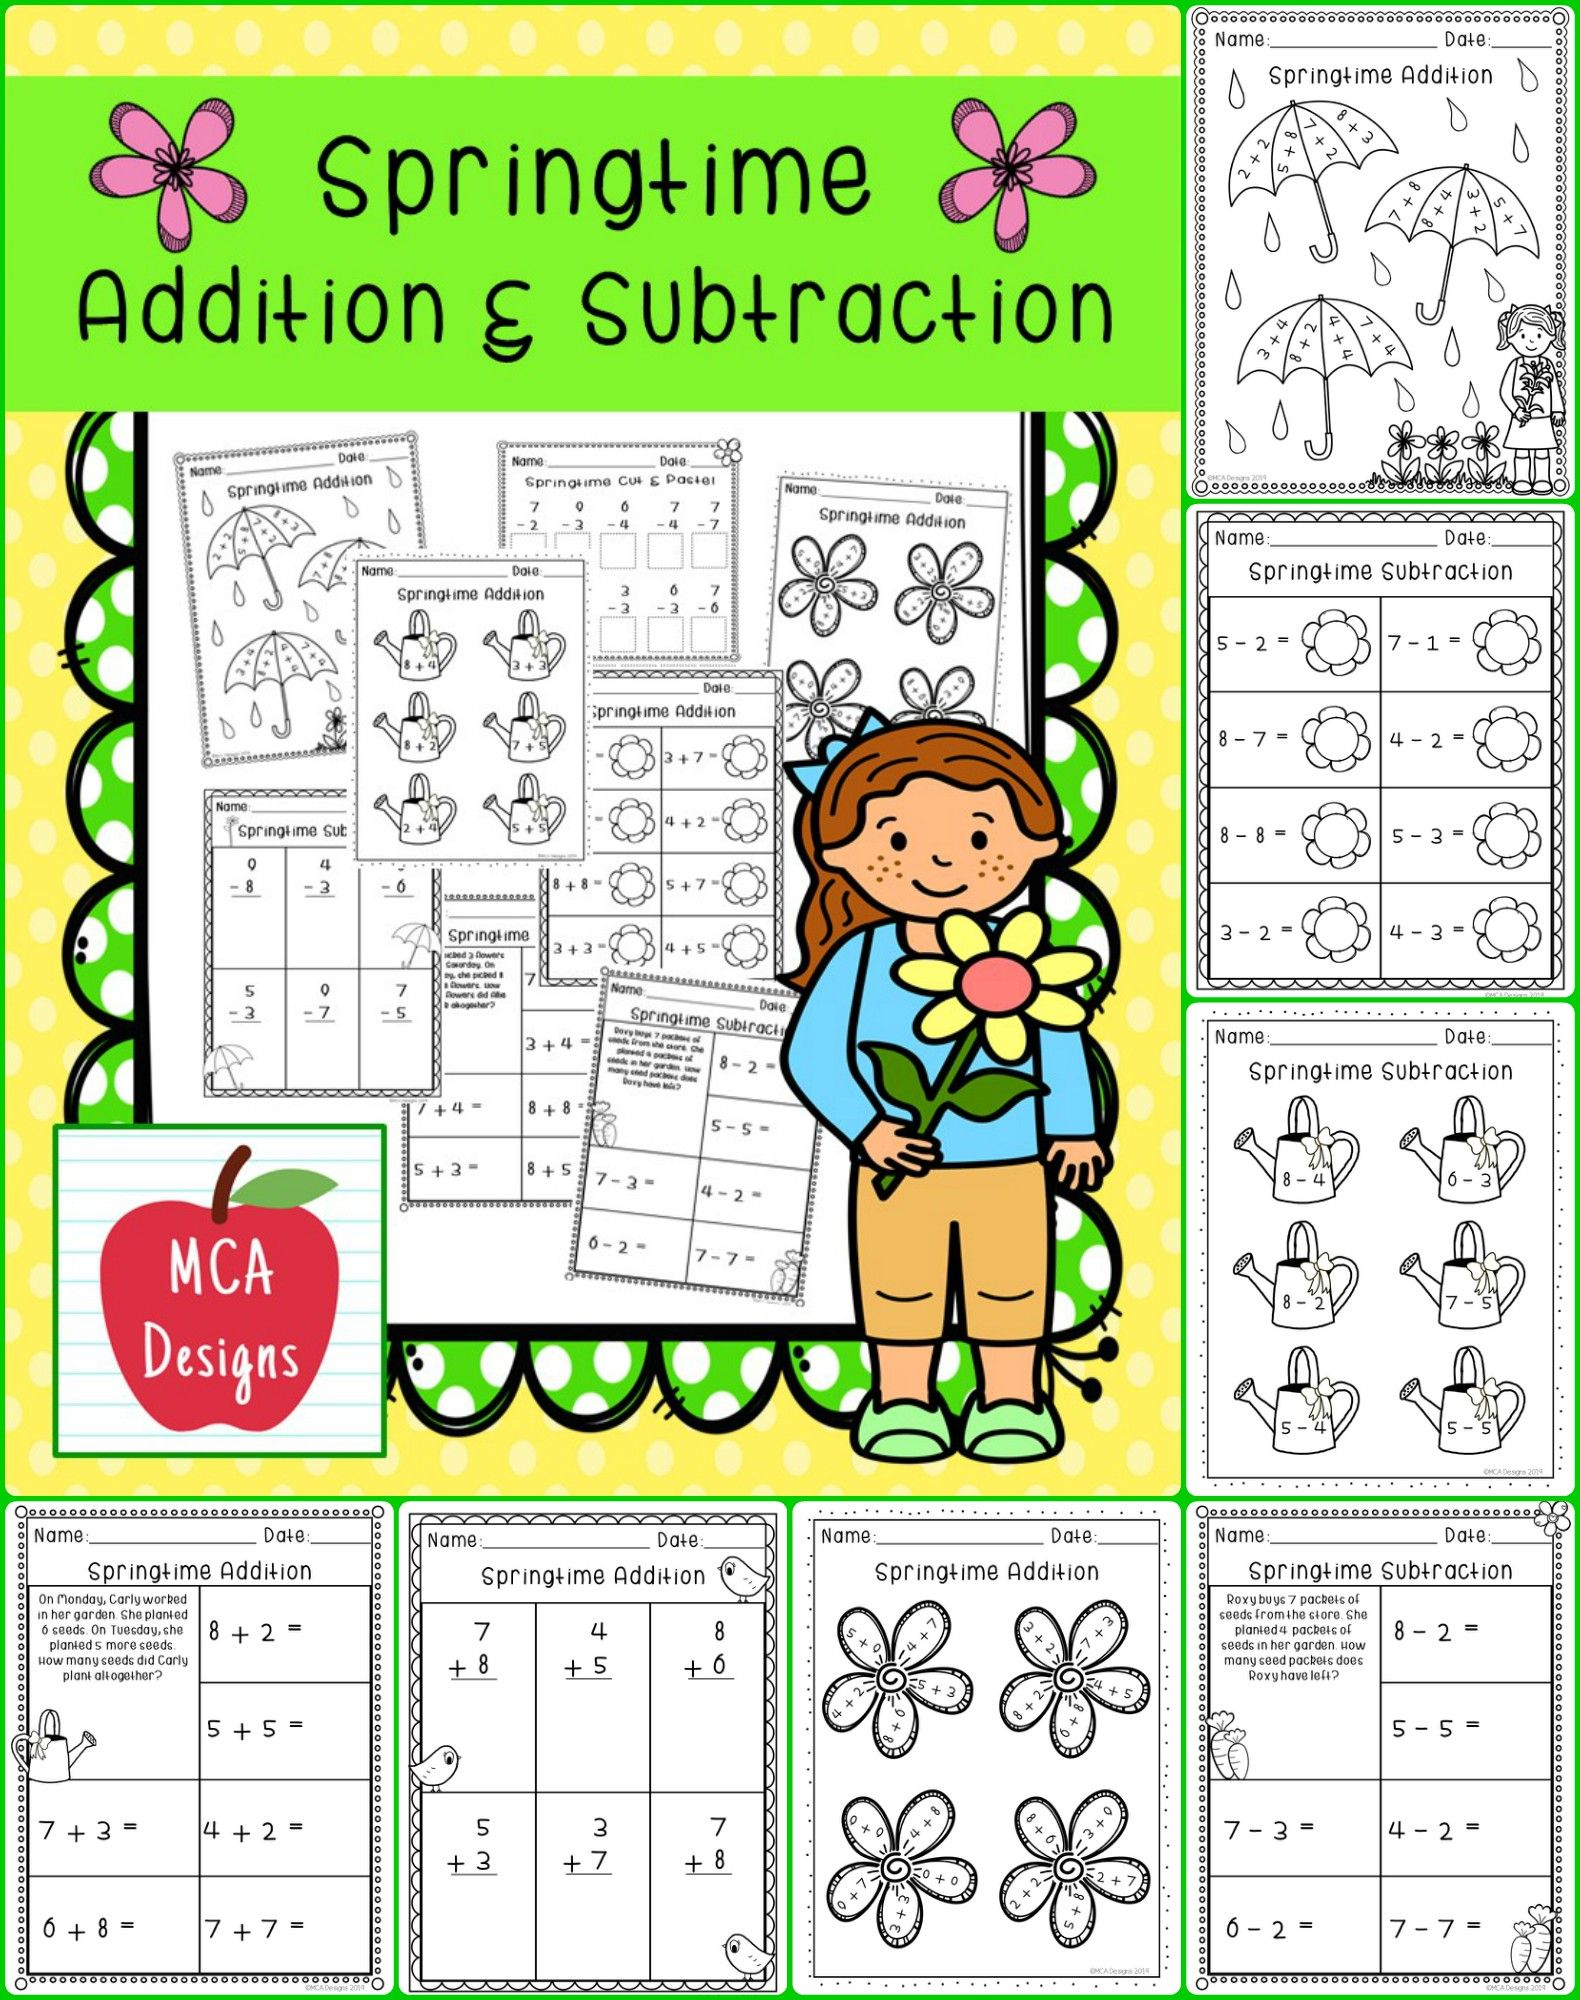 Springtime Addition Amp Subtraction